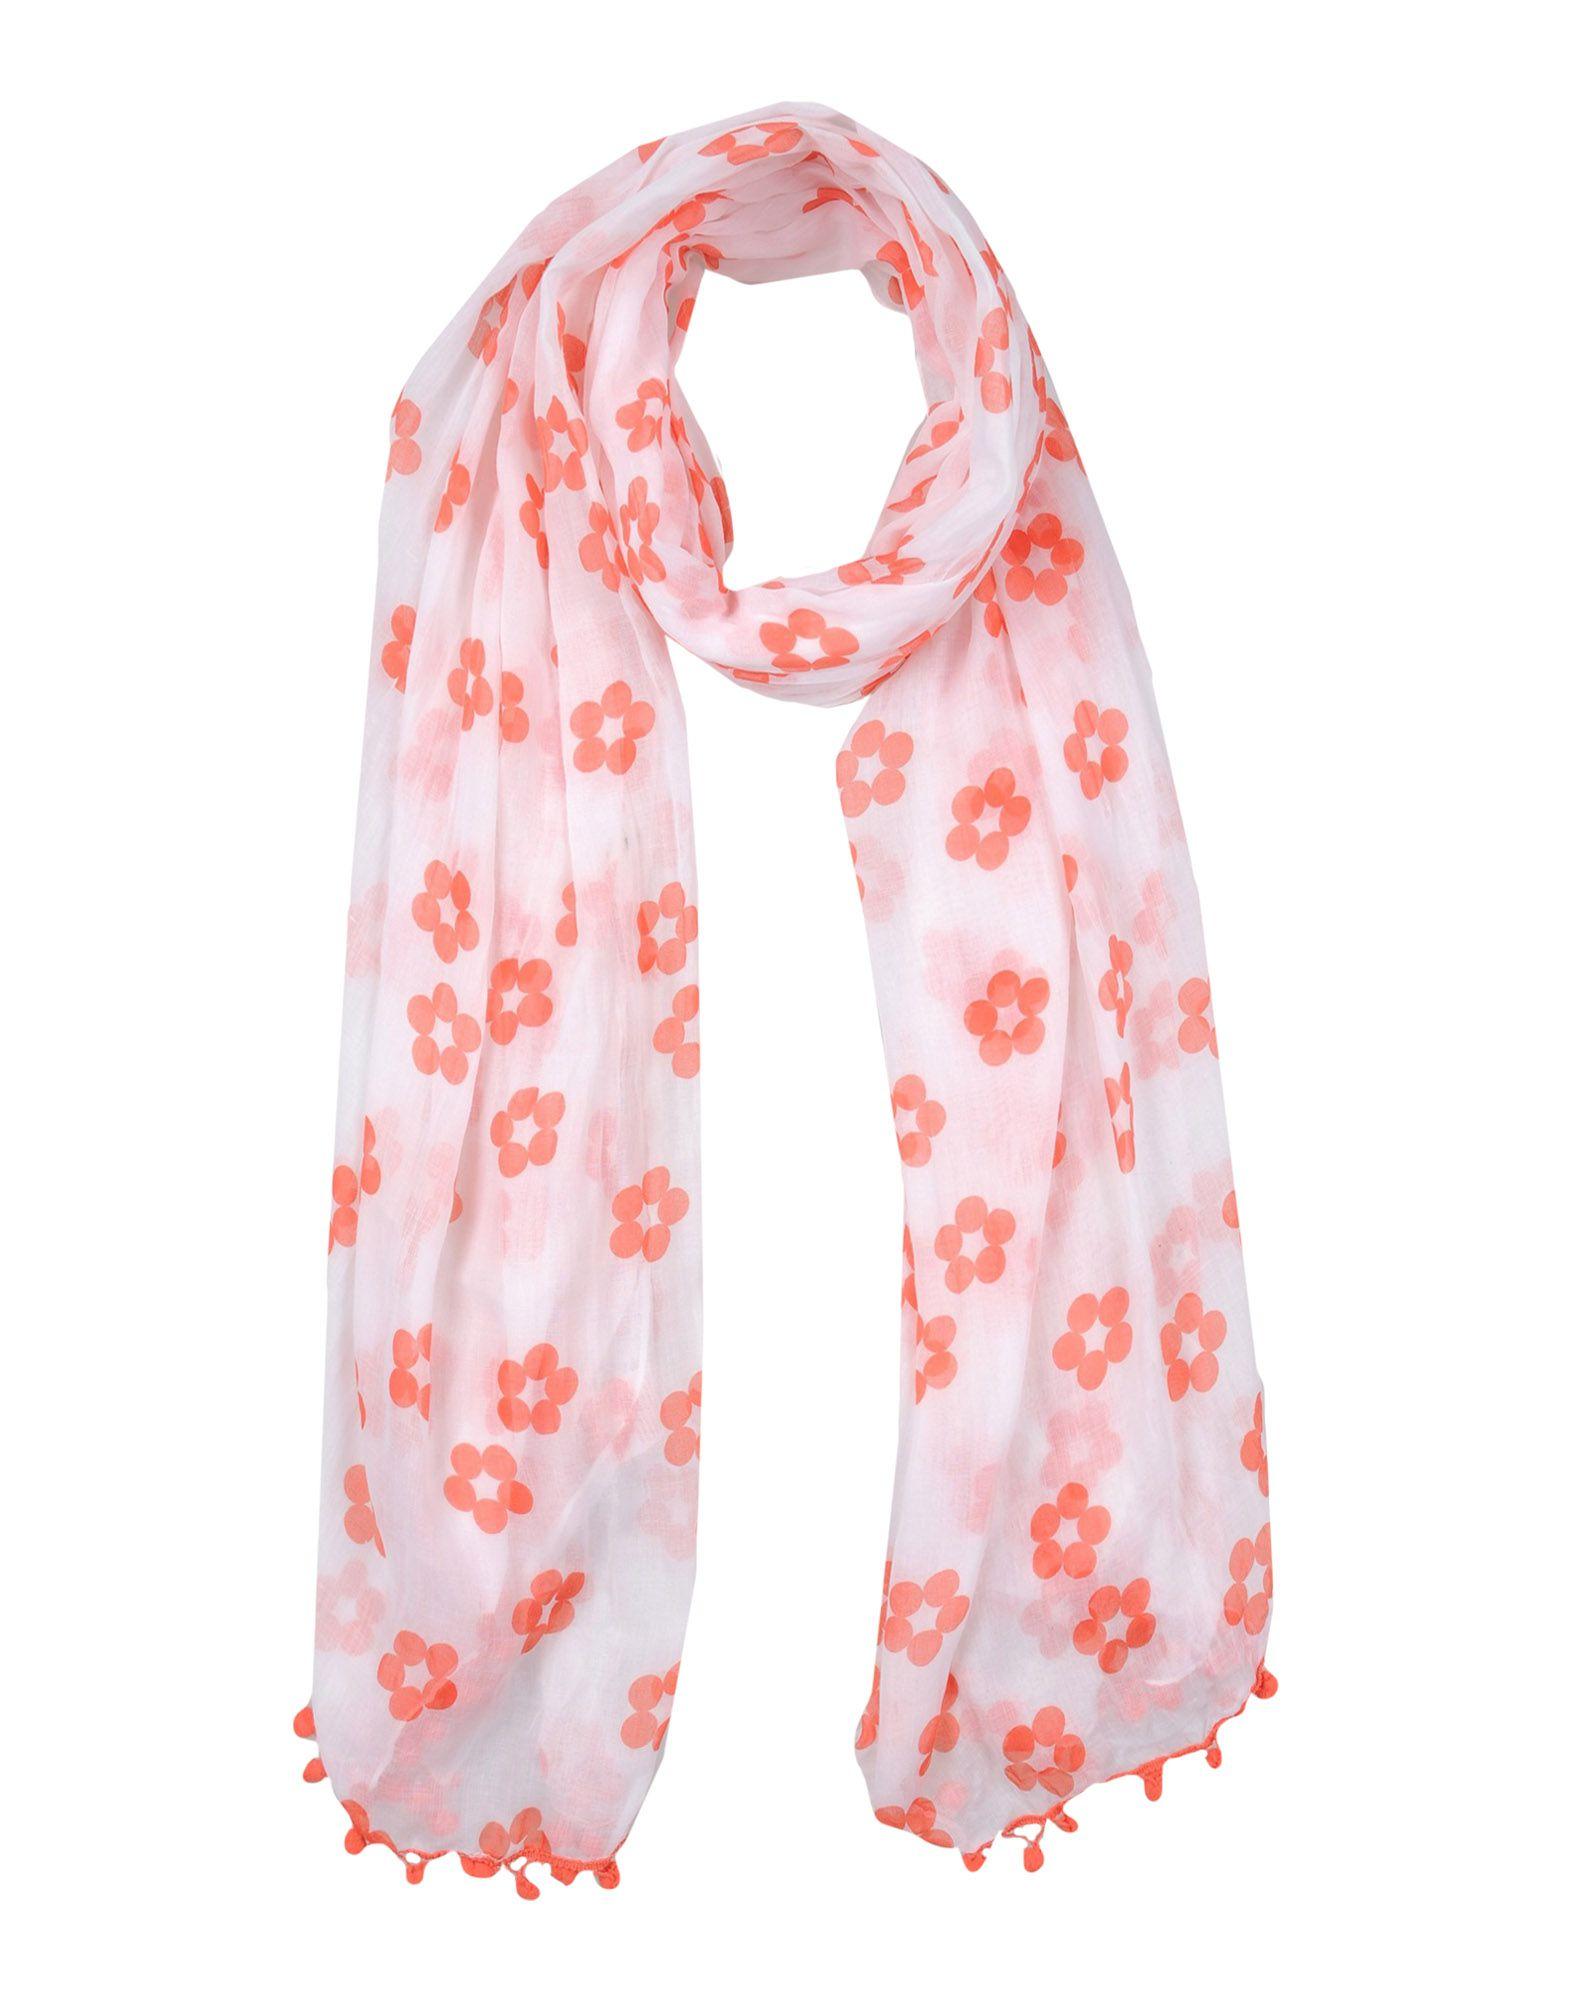 VERO MODA Палантин джемпер женский vero moda цвет розовый 10189425 misty rose размер s 42